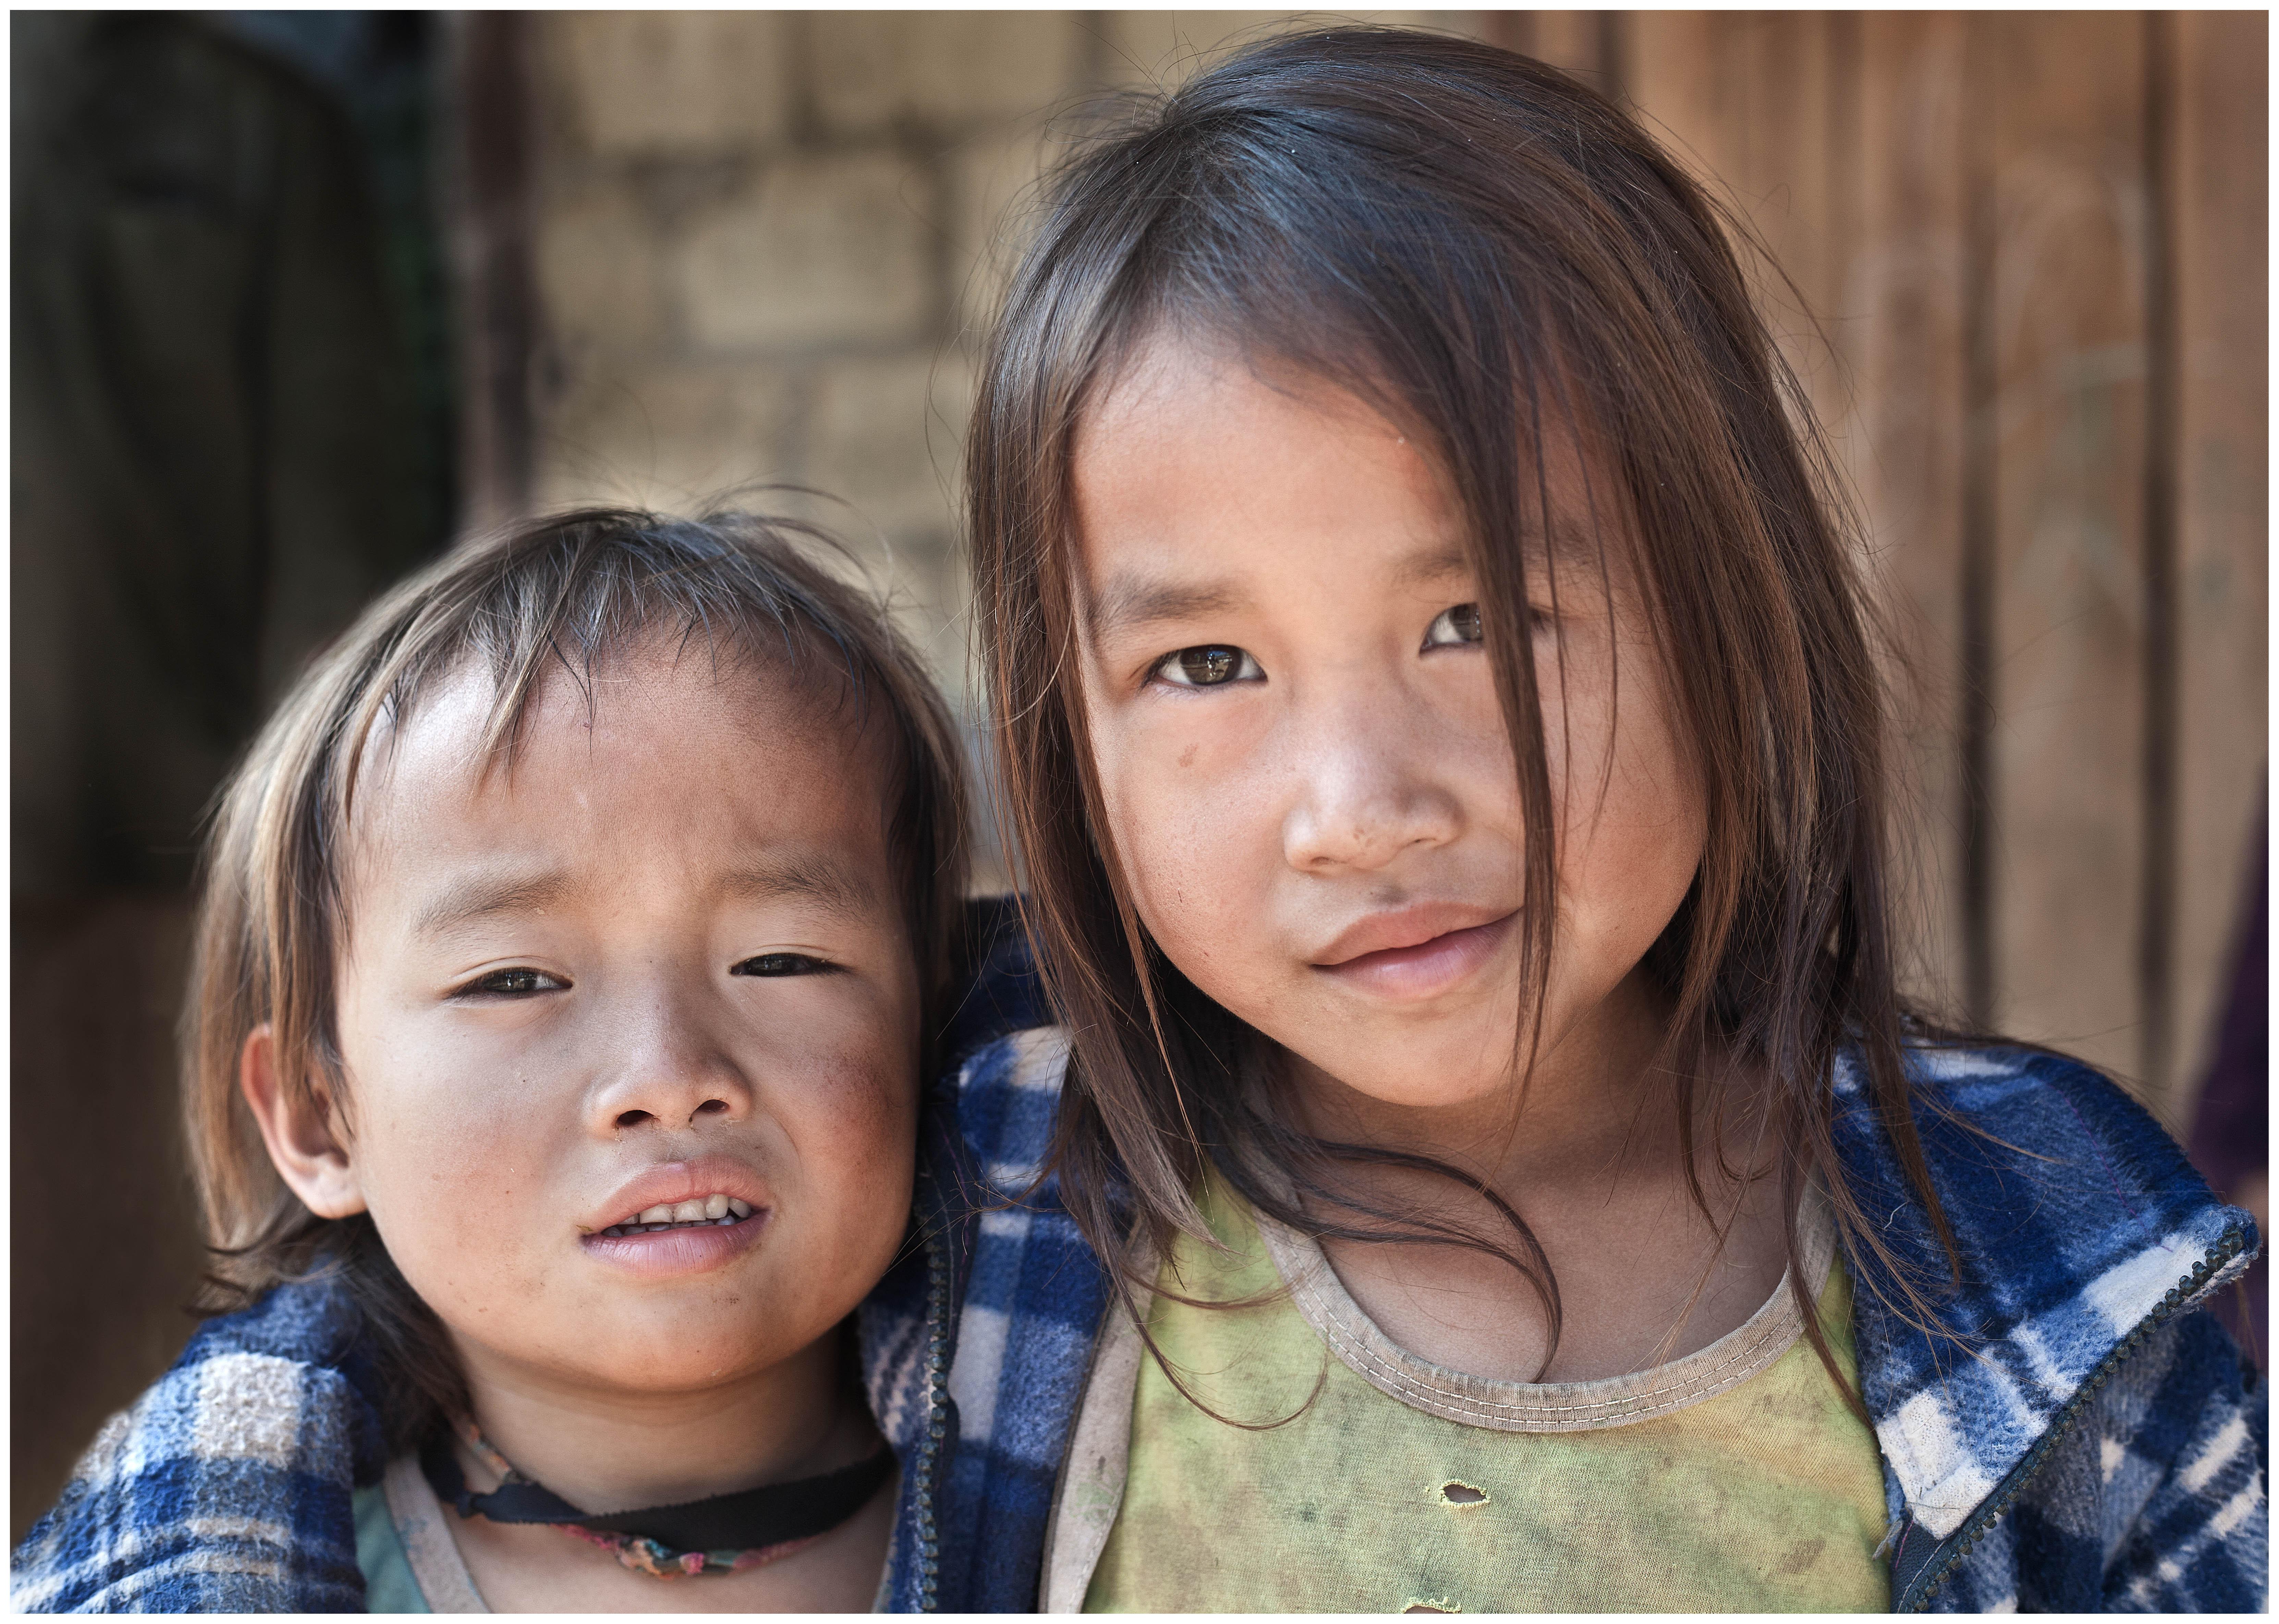 HmongAmericans